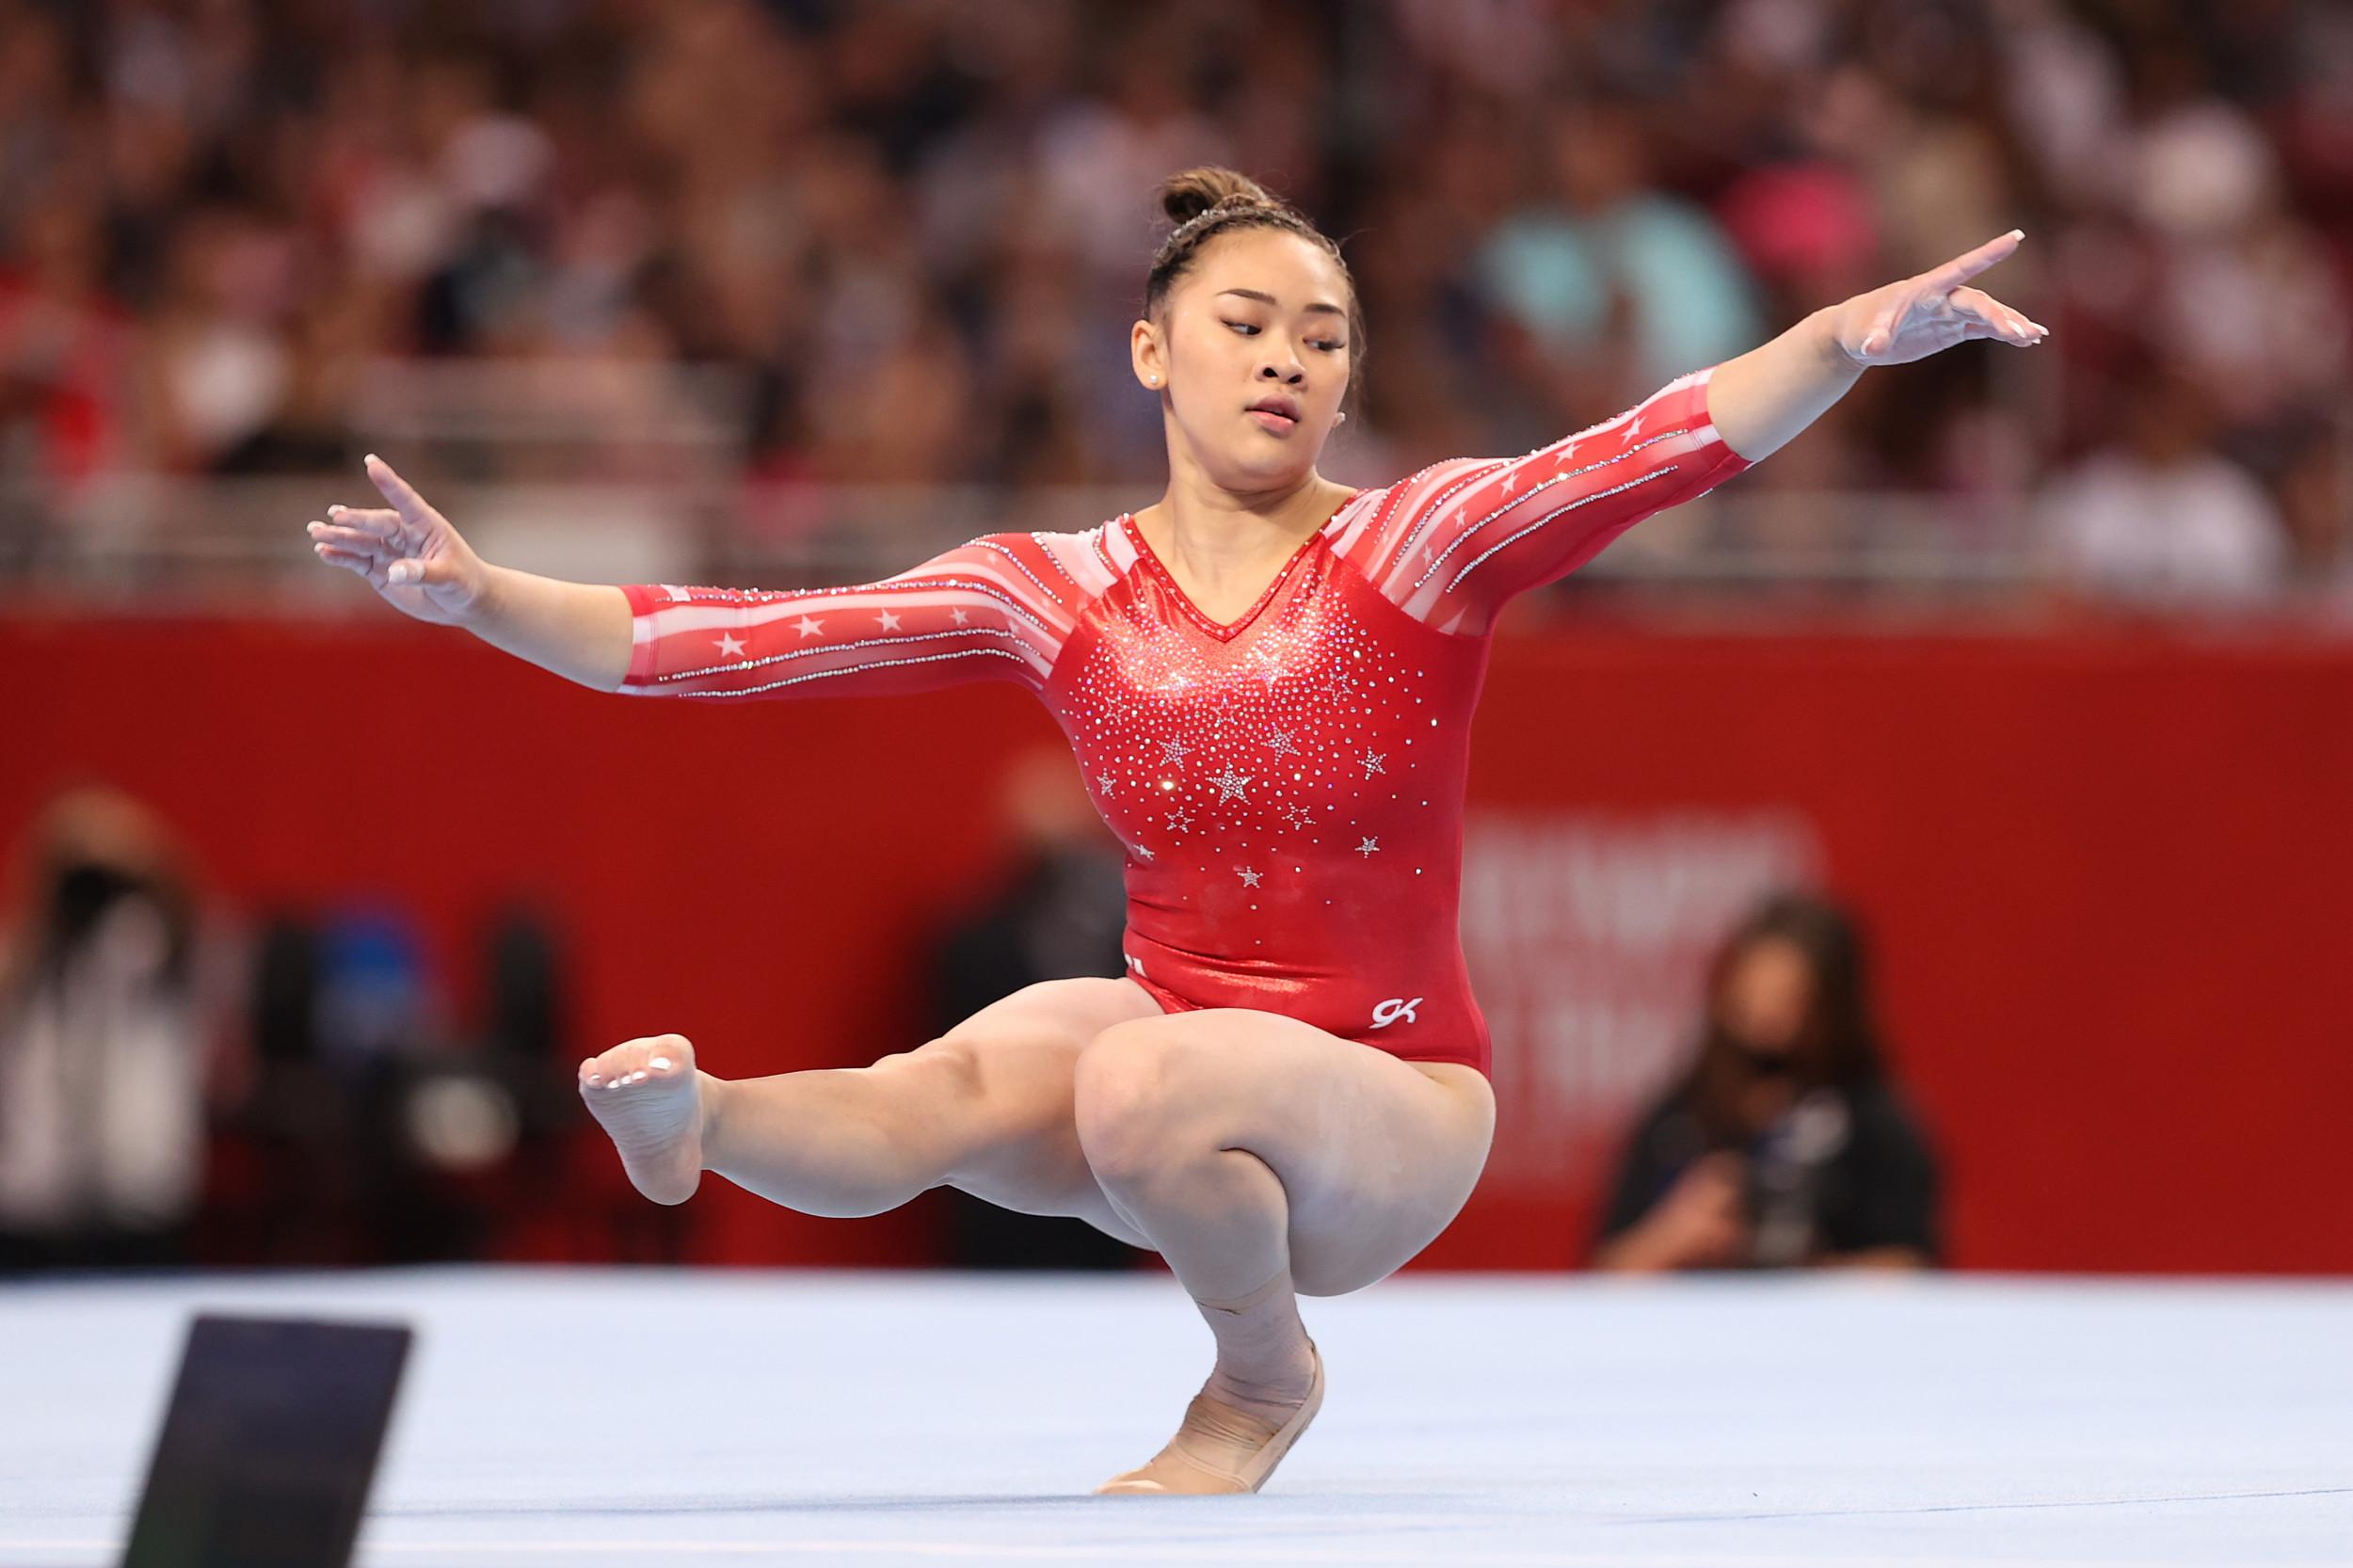 Meet Sunisa Lee, The U.S. Gymnastics Team's Rising Star